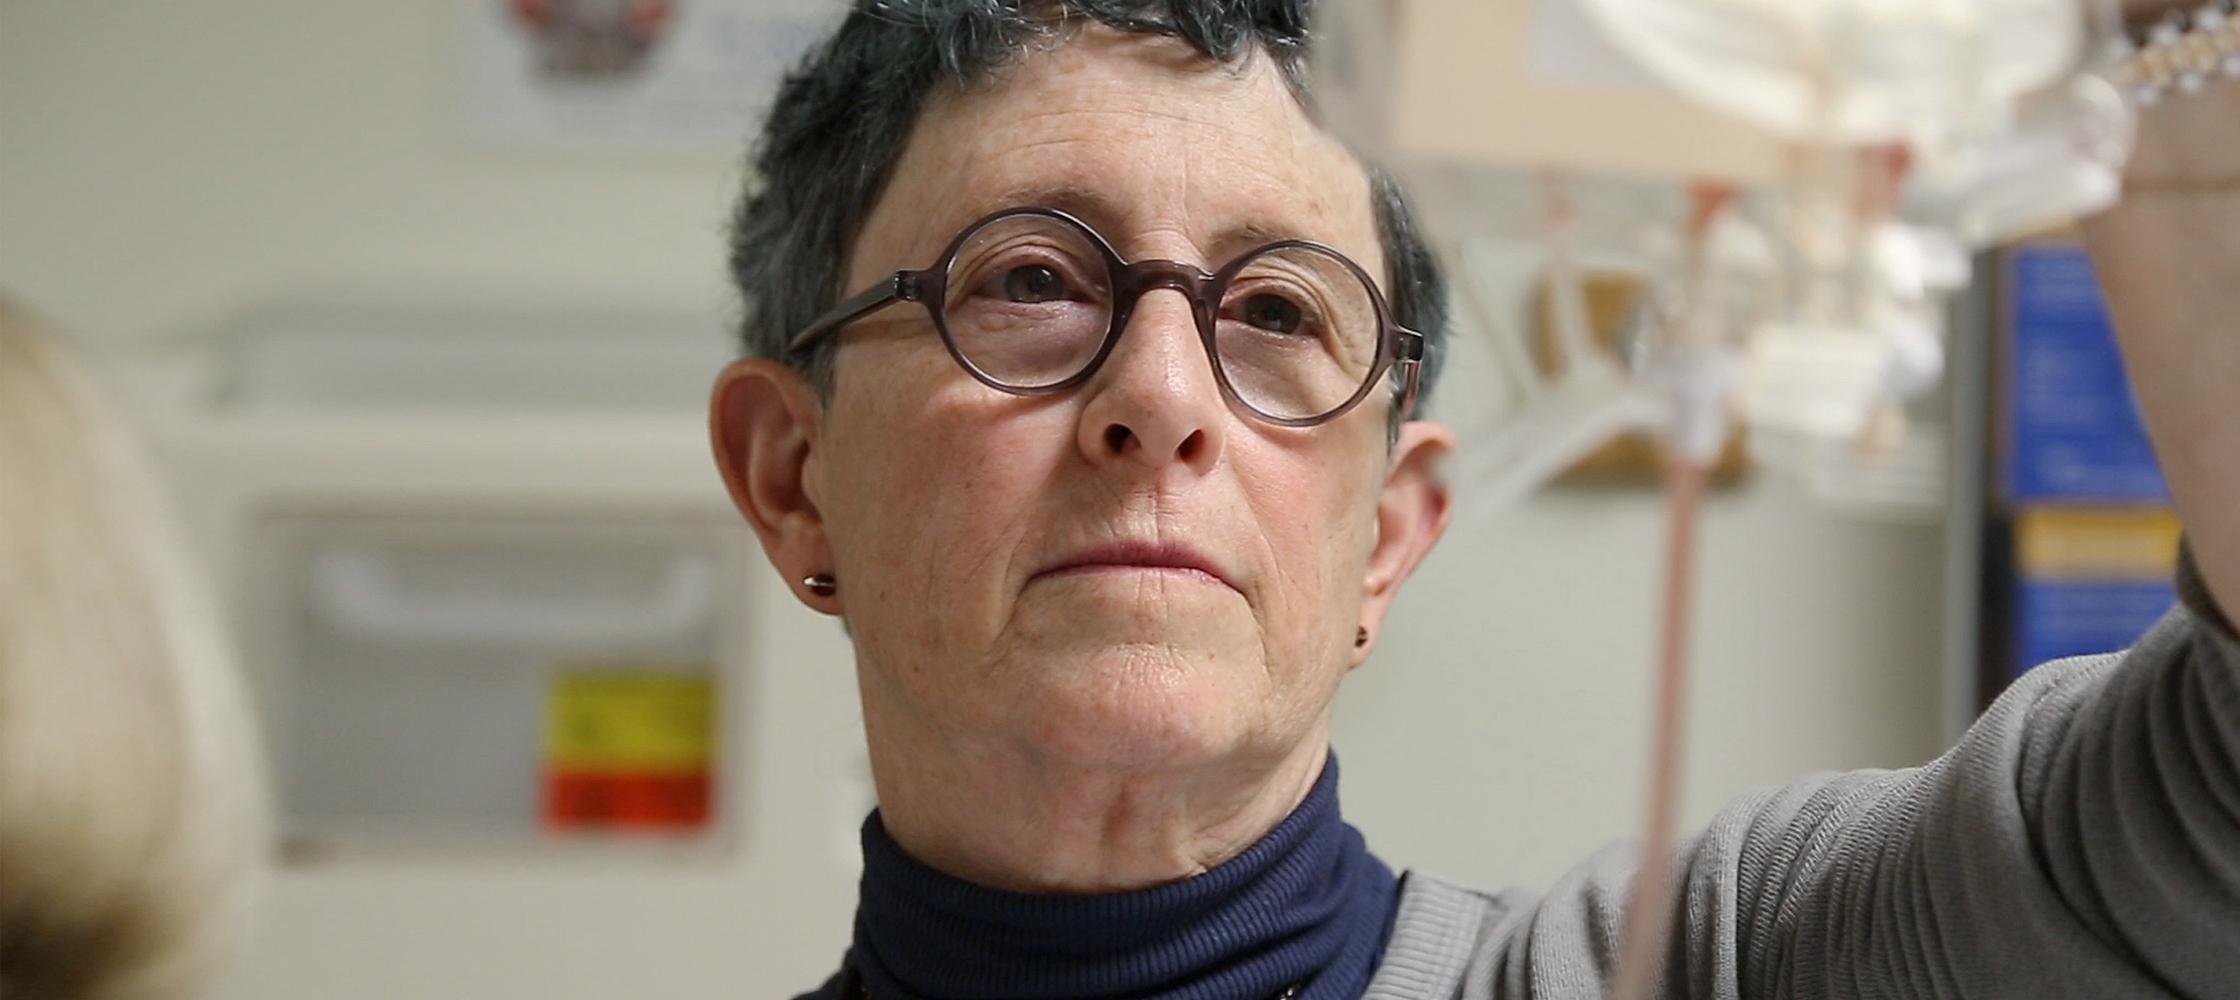 Joanne Kurtzberg, MD, pediatric bone marrow transplant specialist at Duke